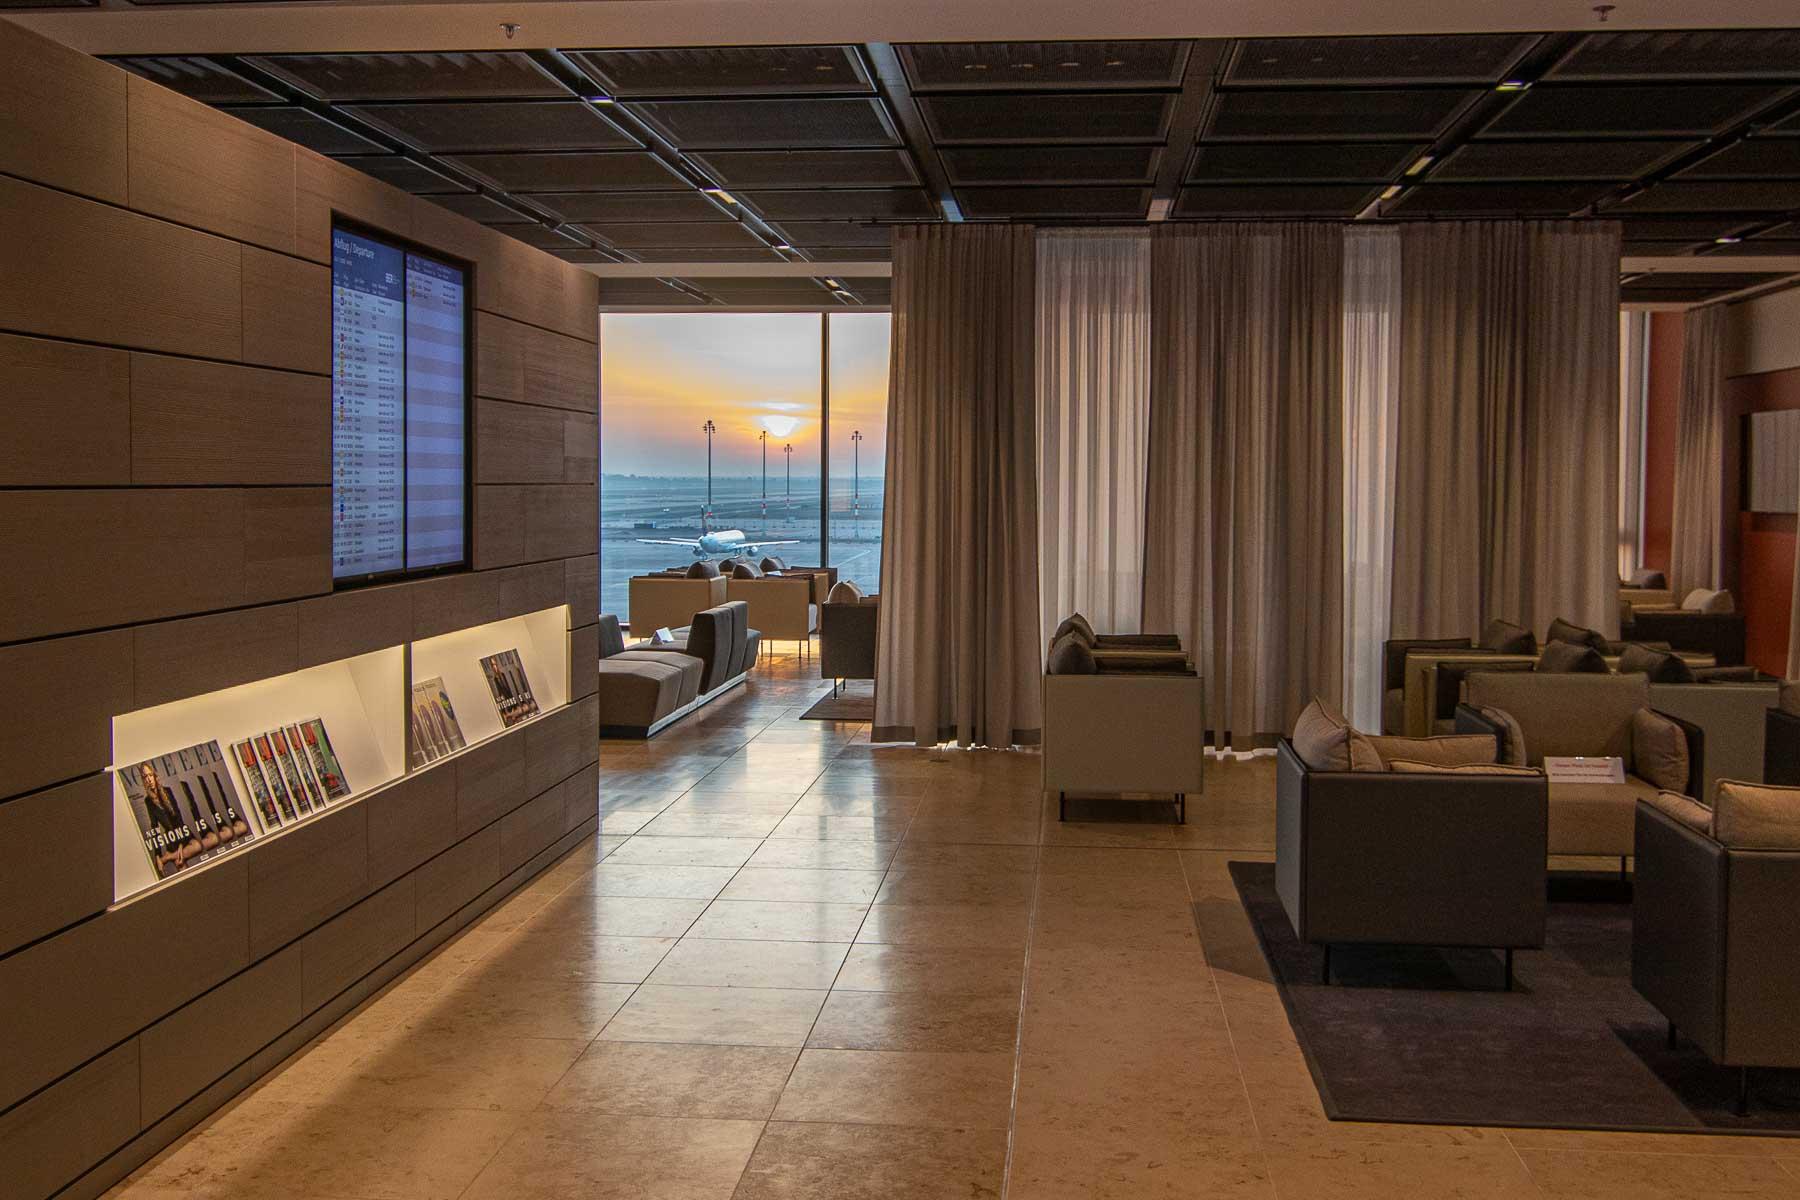 Flughafen BER Lounge Business